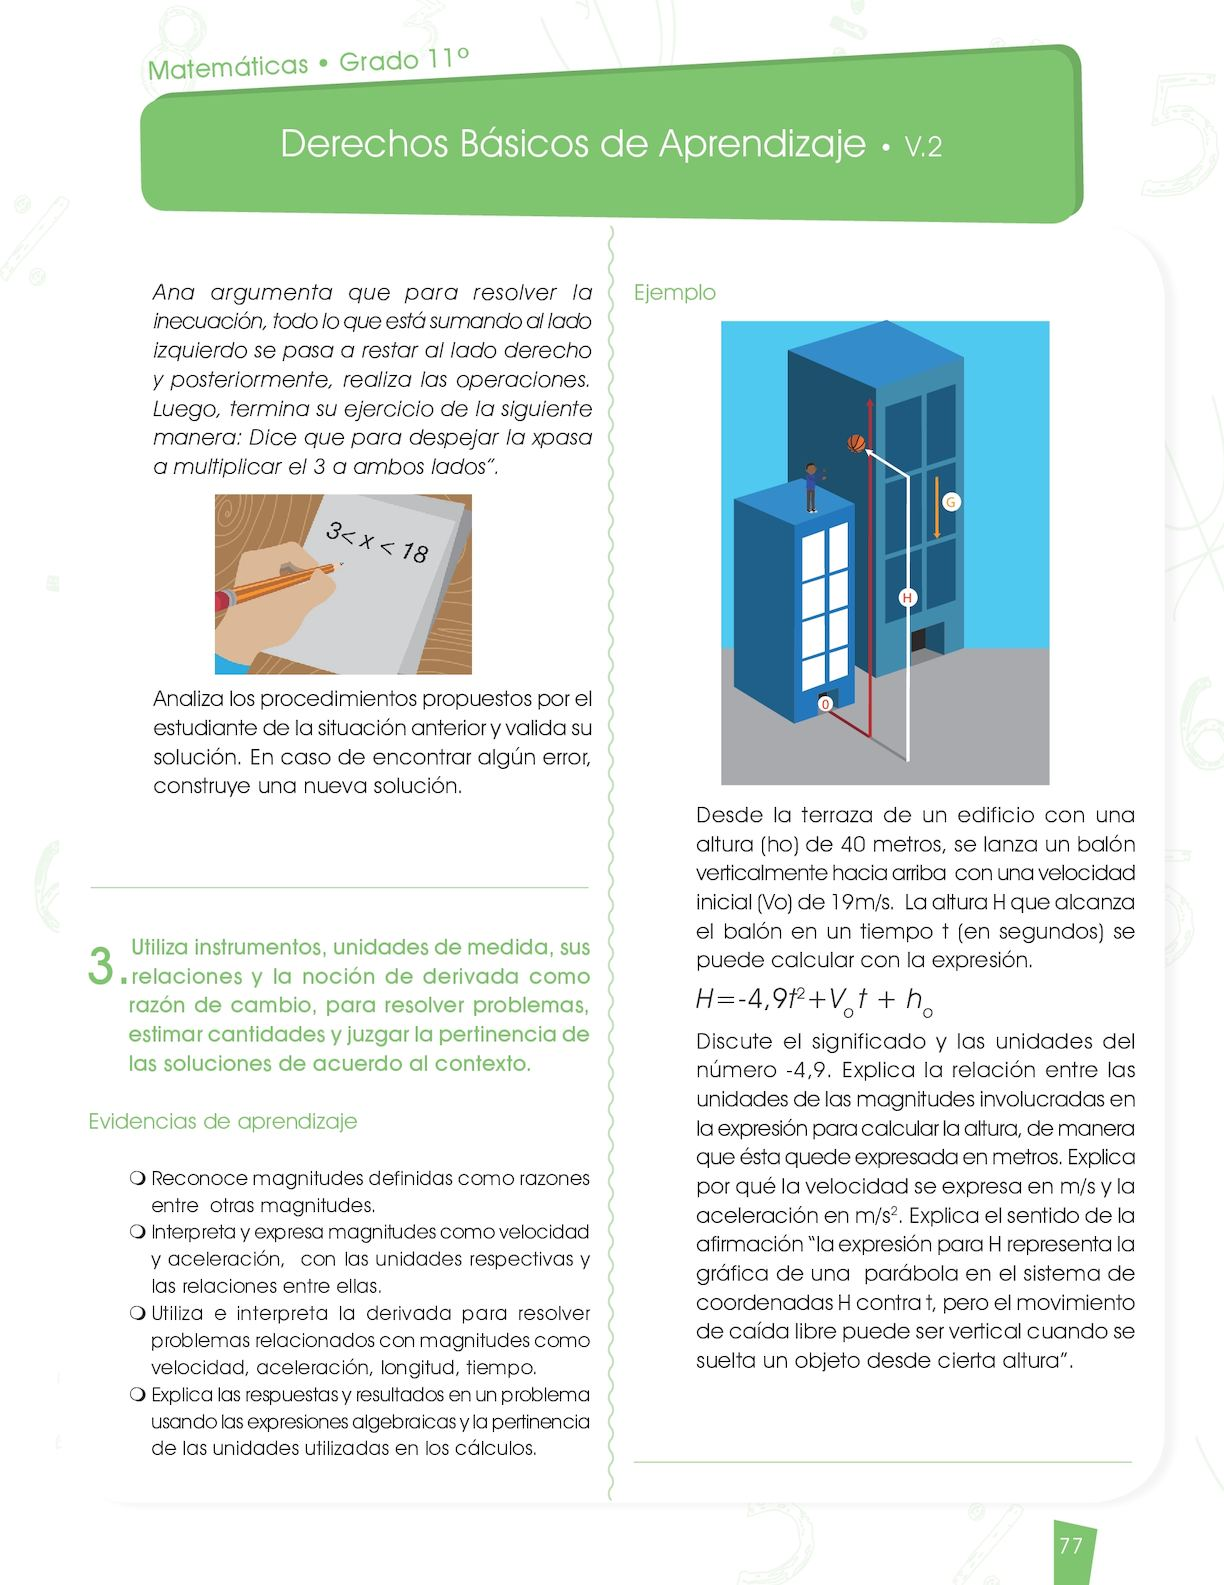 Dba Matematica Version 2 Calameo Downloader